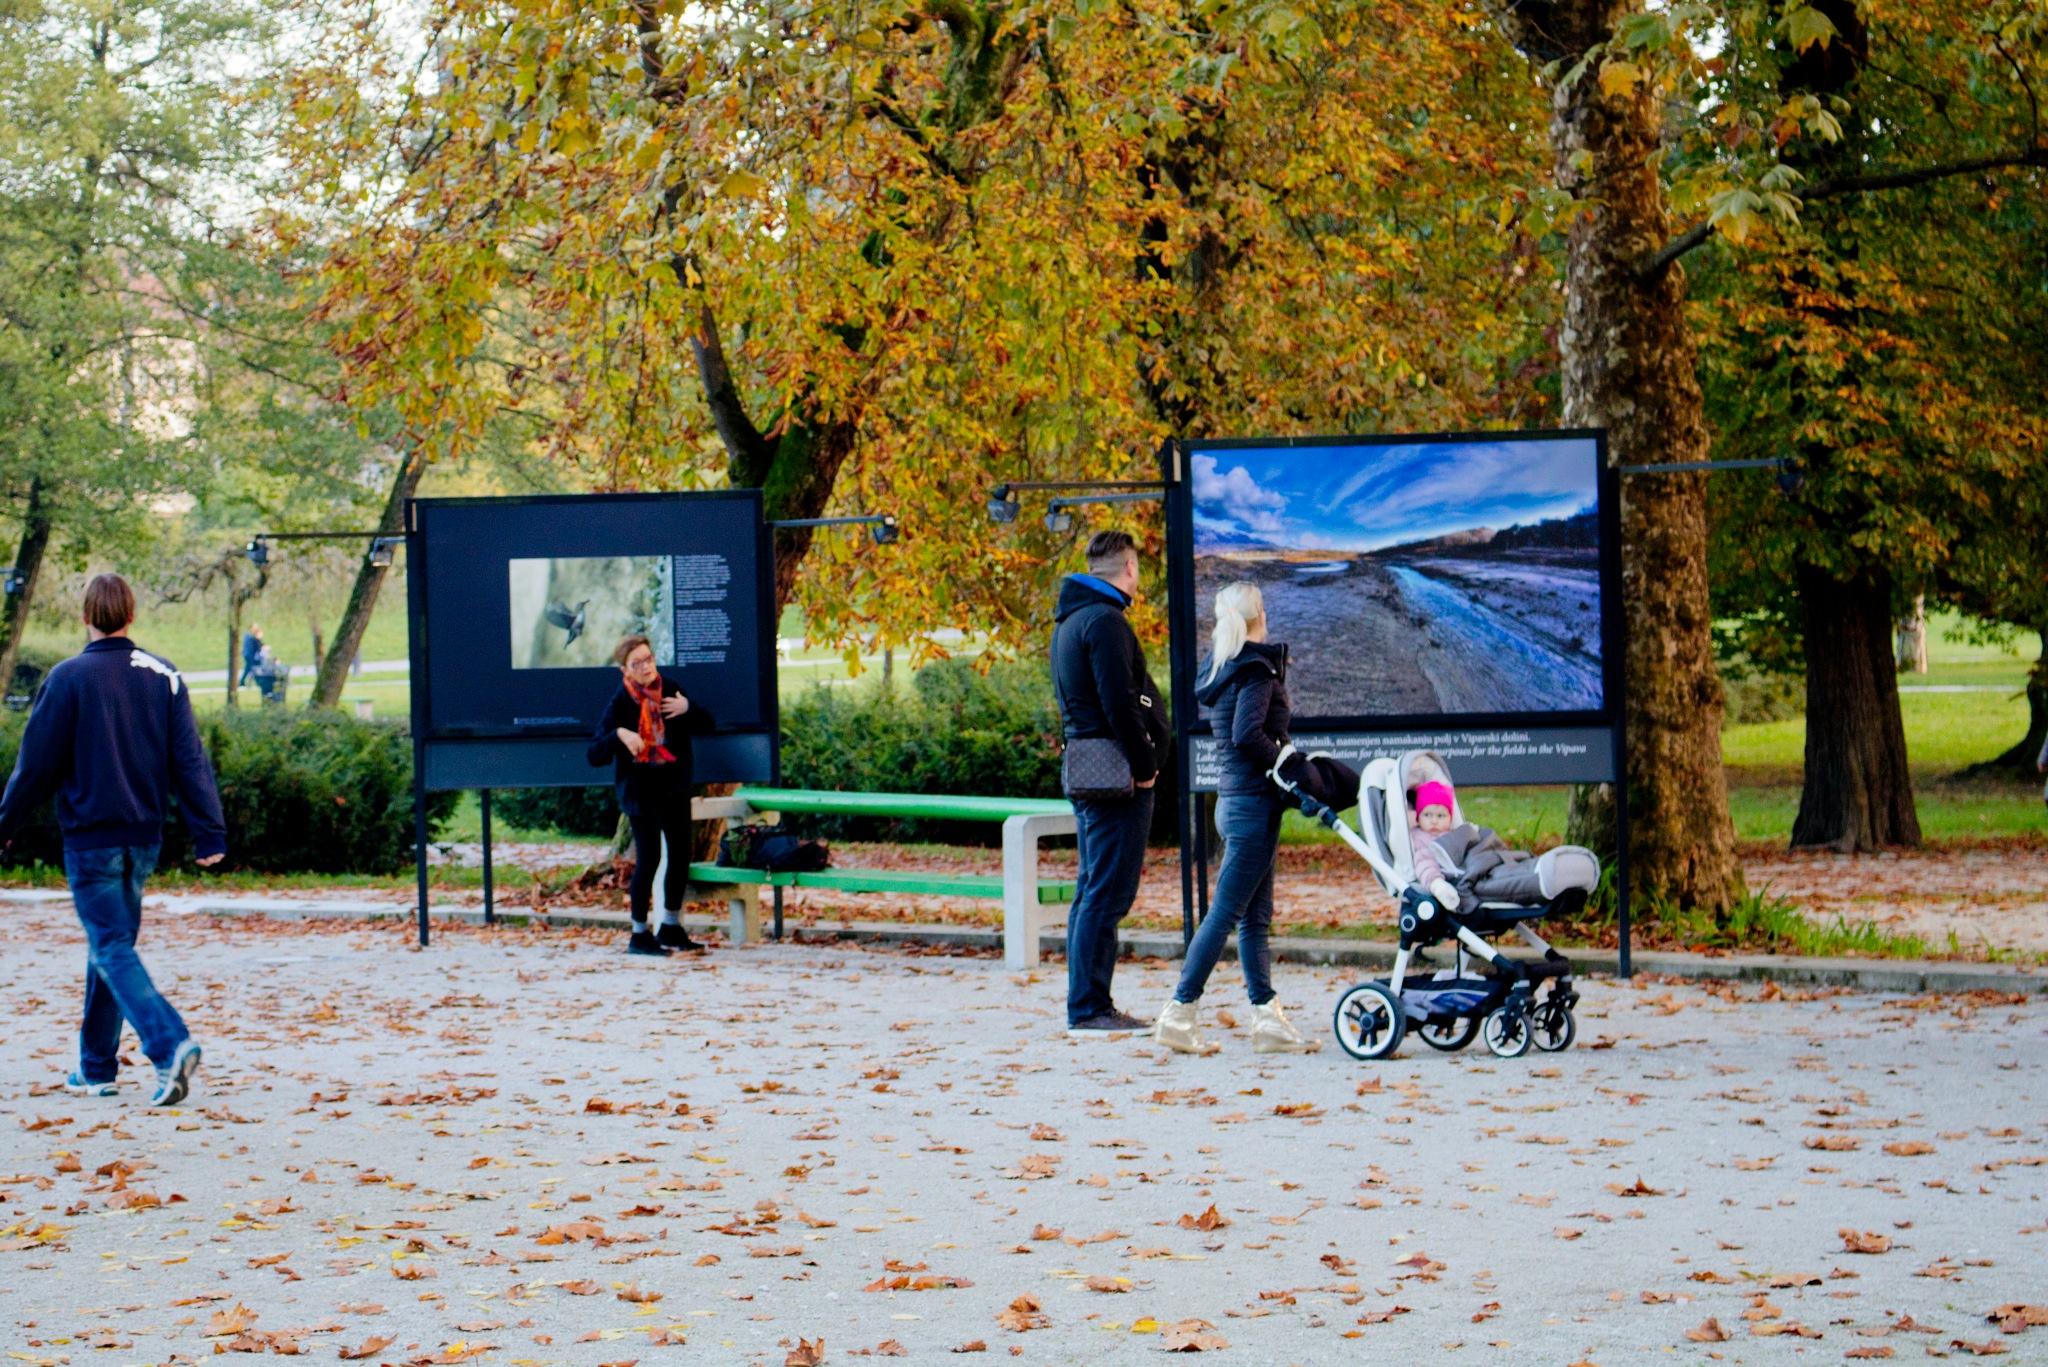 Park Tivoli Ljubljana by zvnktomasevic